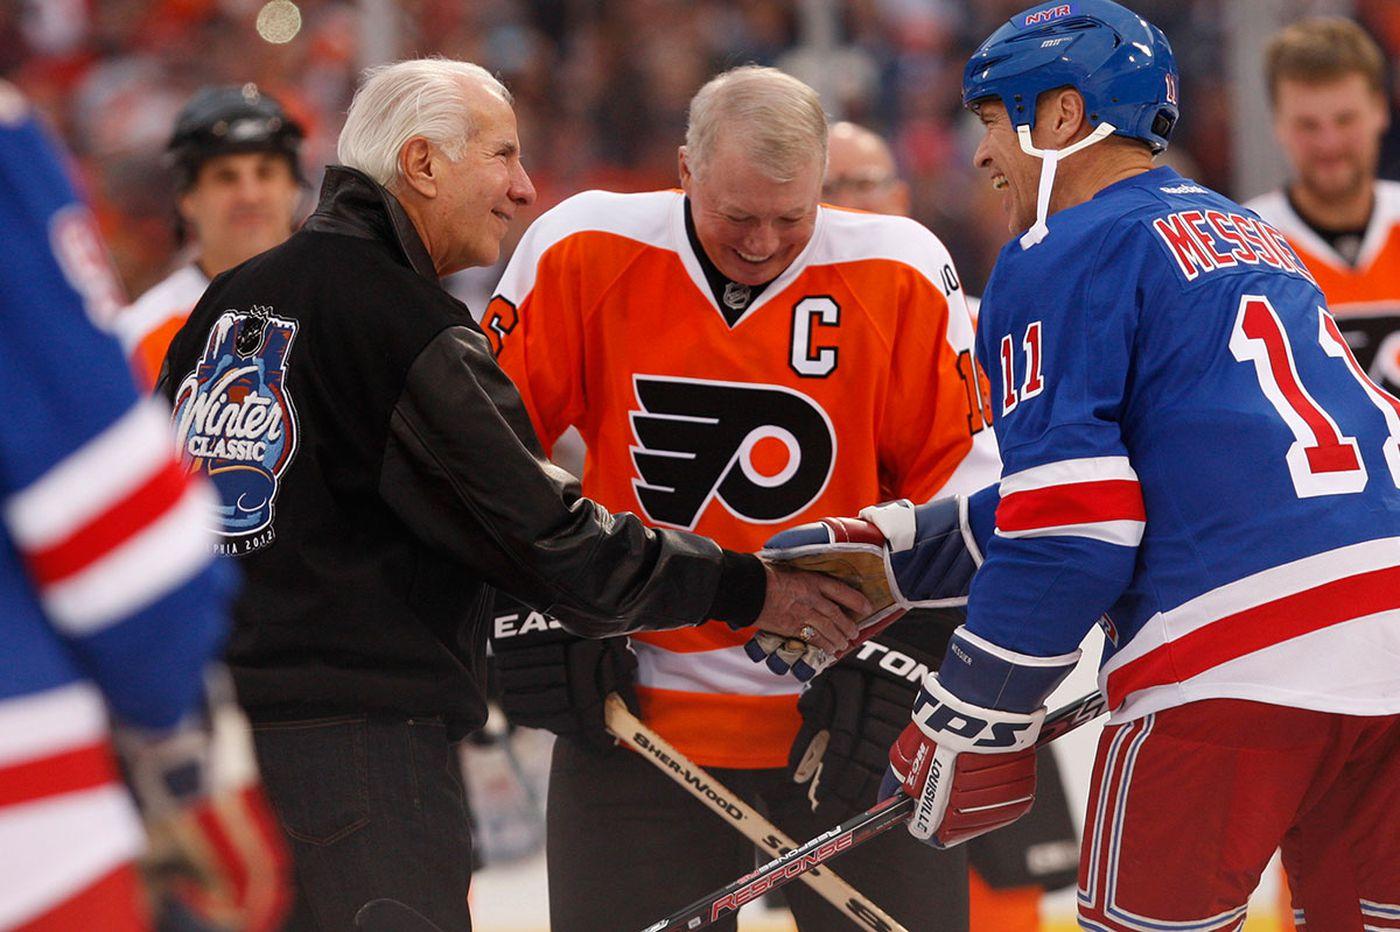 Donnellon: Ed Snider invented hockey in Philadelphia